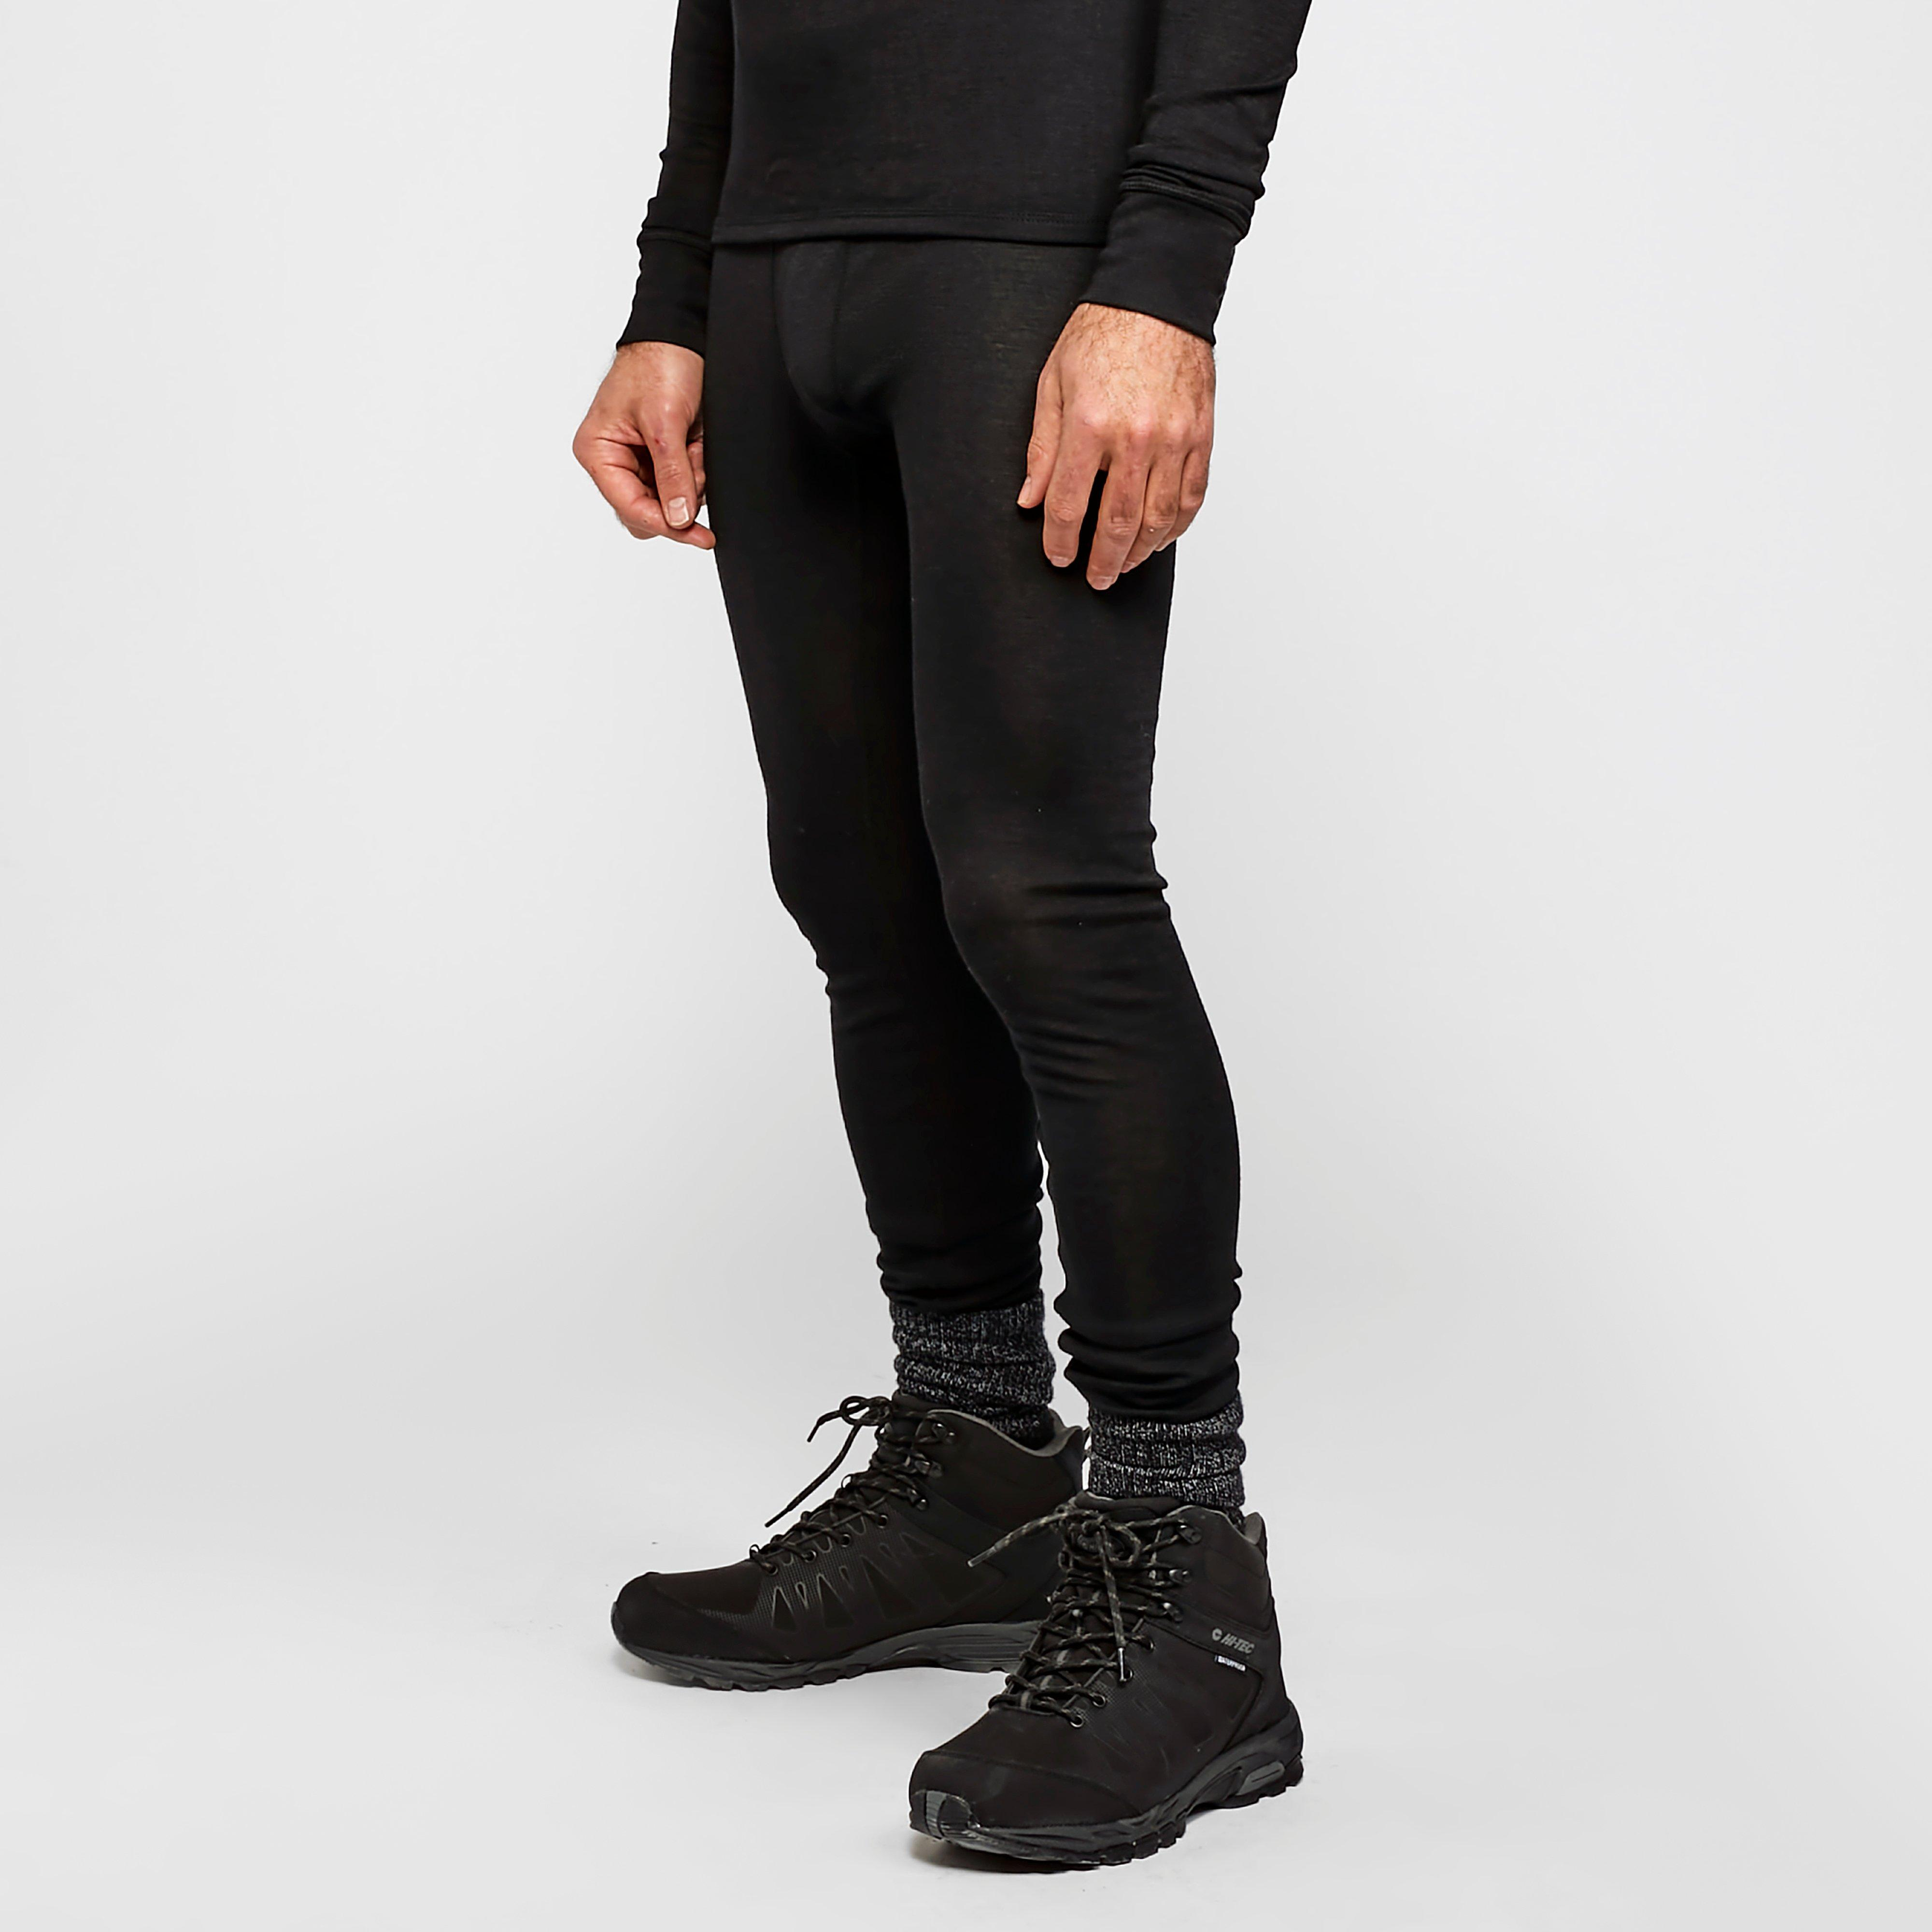 Image of Peter Storm Men's Merino Pant - Black/Black, Black/Black